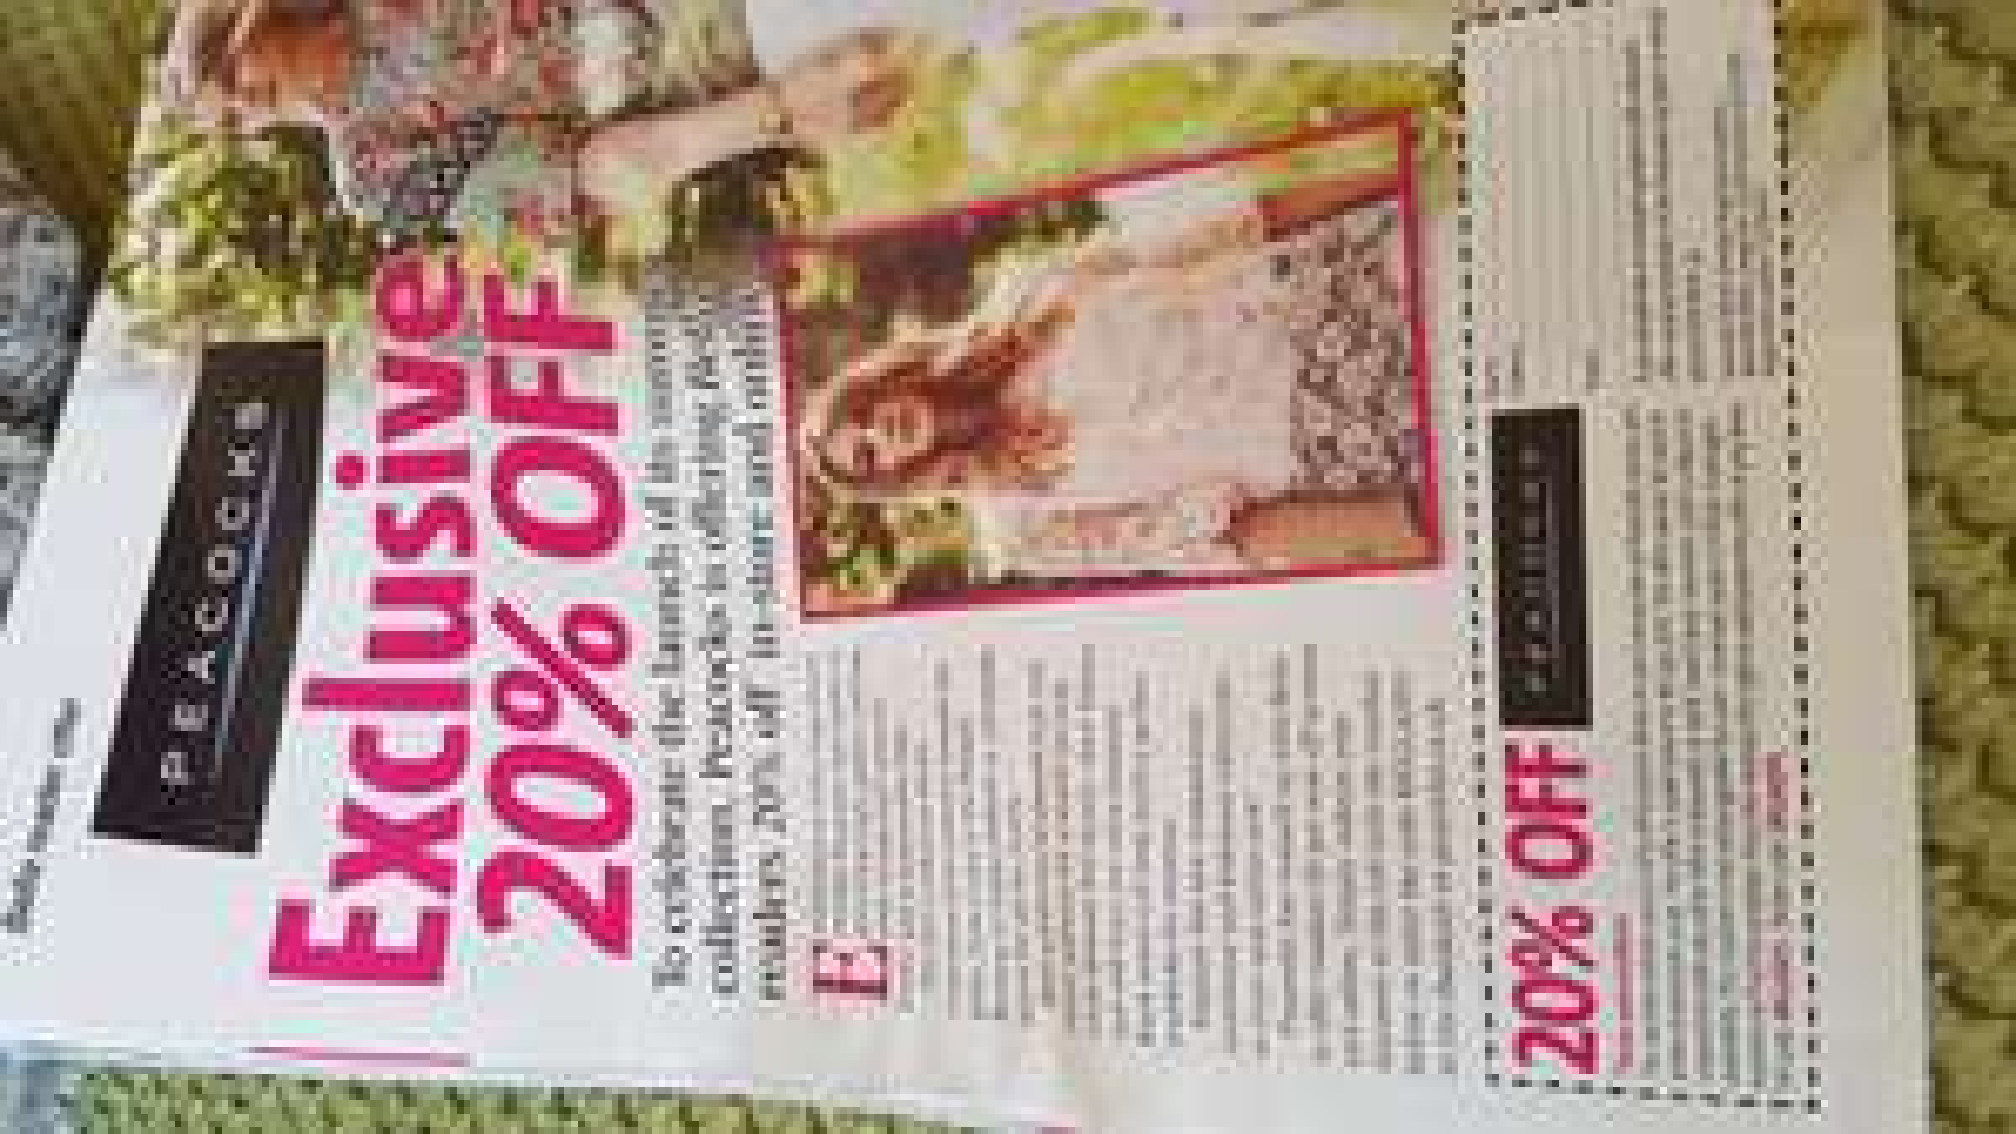 Bella magazine 20% off voucher in-store or online @ Peacocks